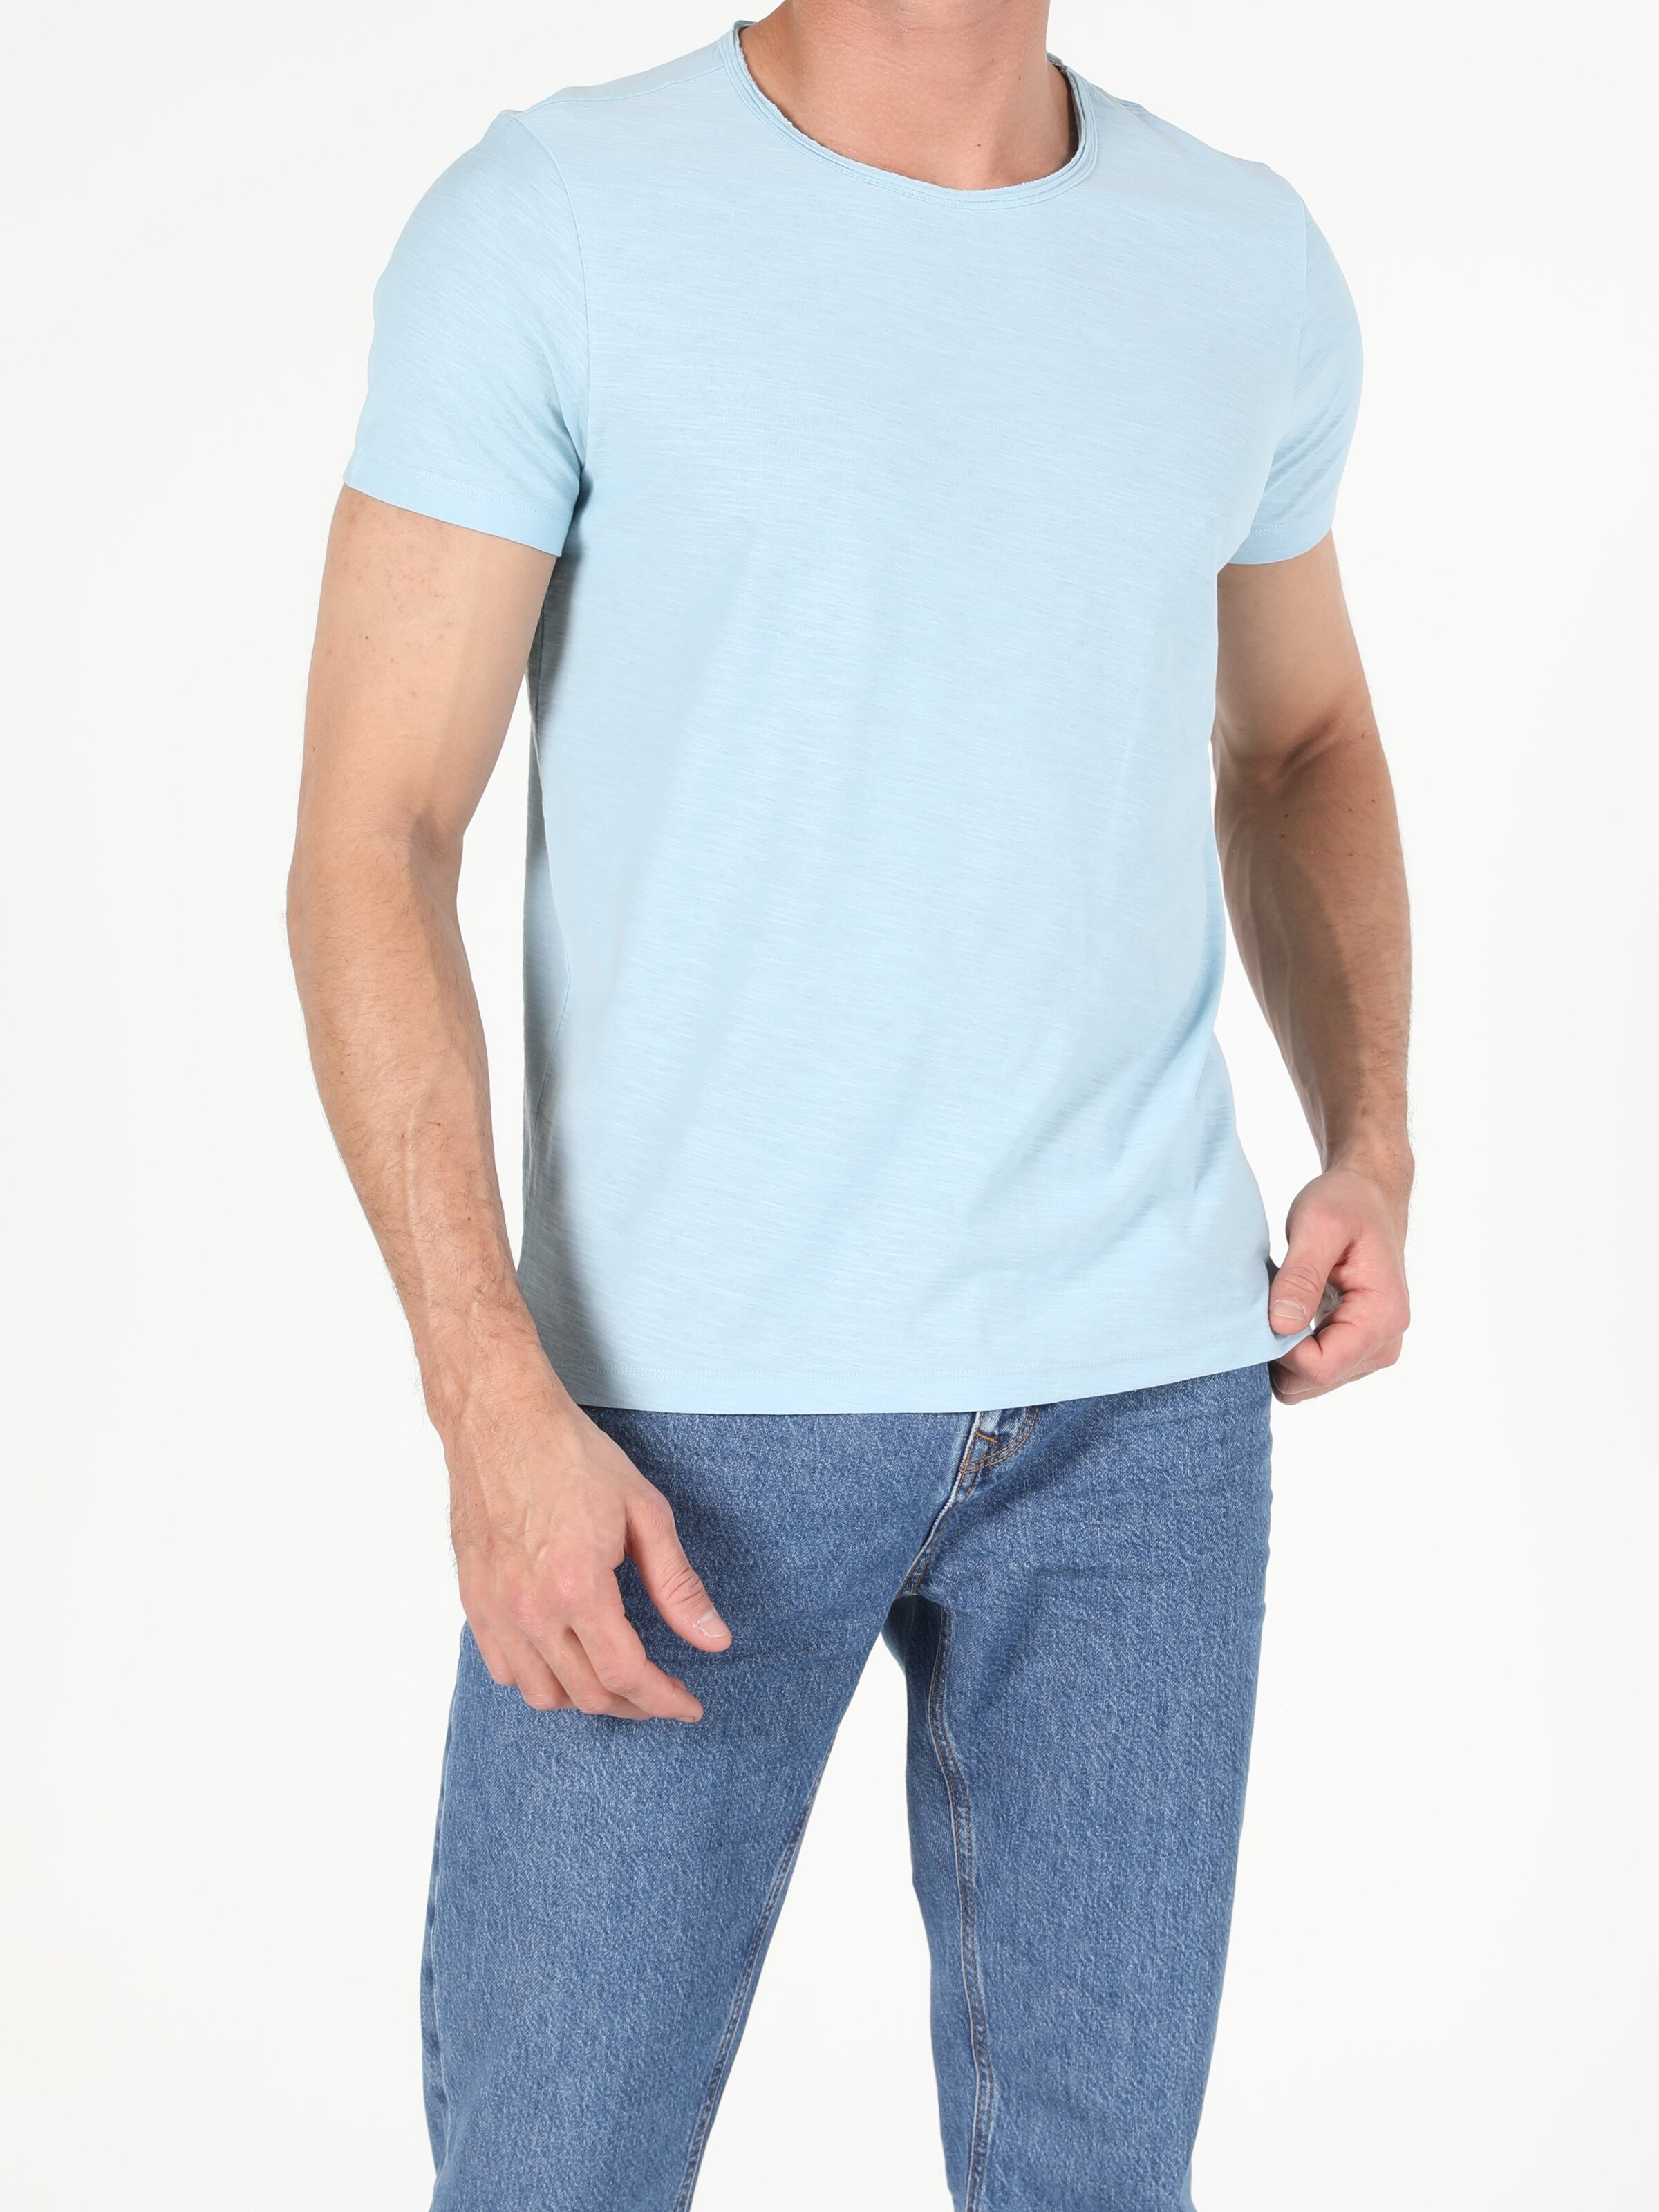 Regular Fit Bisiklet Yaka Erkek Mavi Kısa Kol Tişört